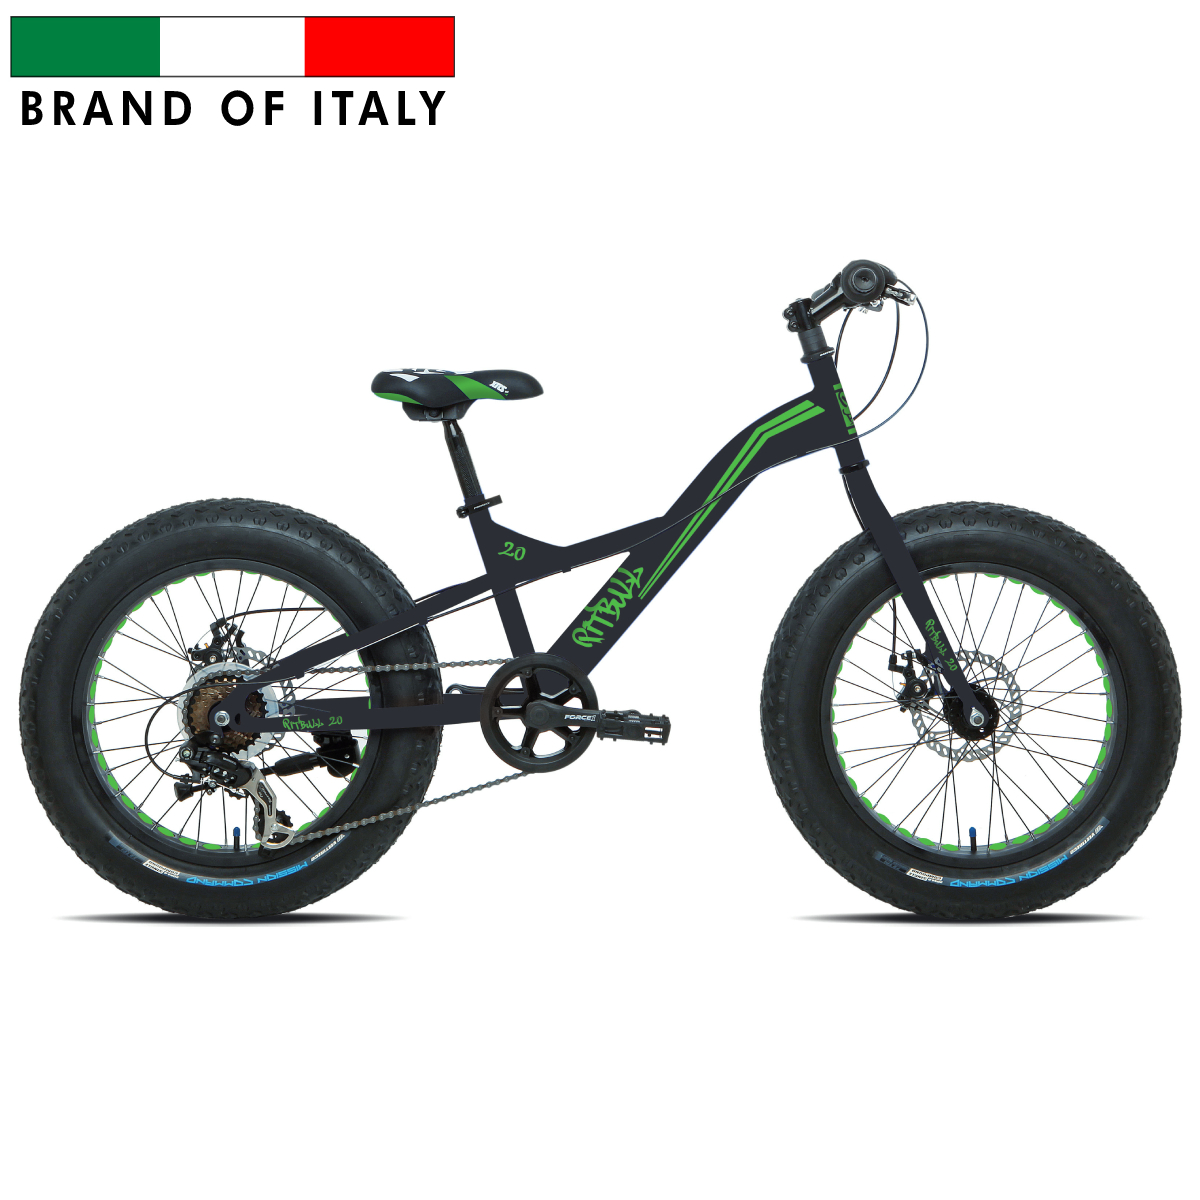 ESPERIA 9020 FAT BIKE 20'' MATT BLACK/GREEN FLUO BK9020 Pilsētas velosipēds